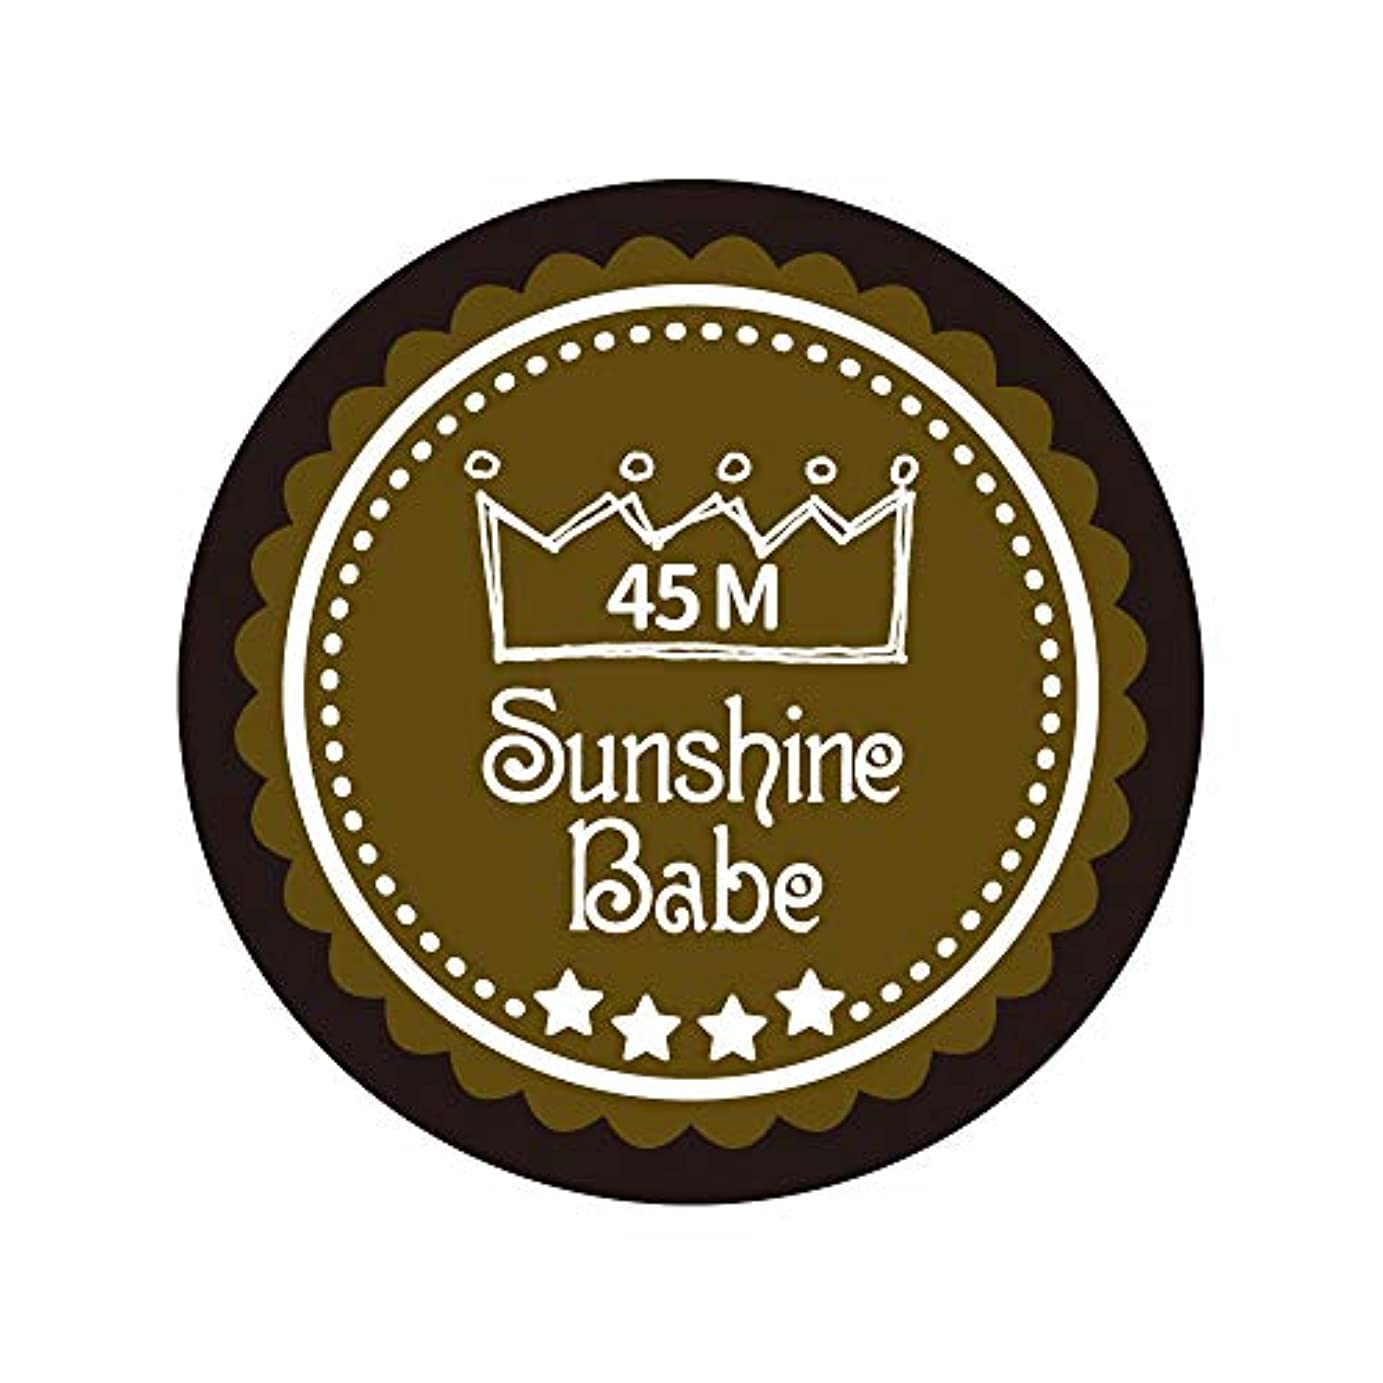 Sunshine Babe カラージェル 45M マティーニオリーブ 4g UV/LED対応